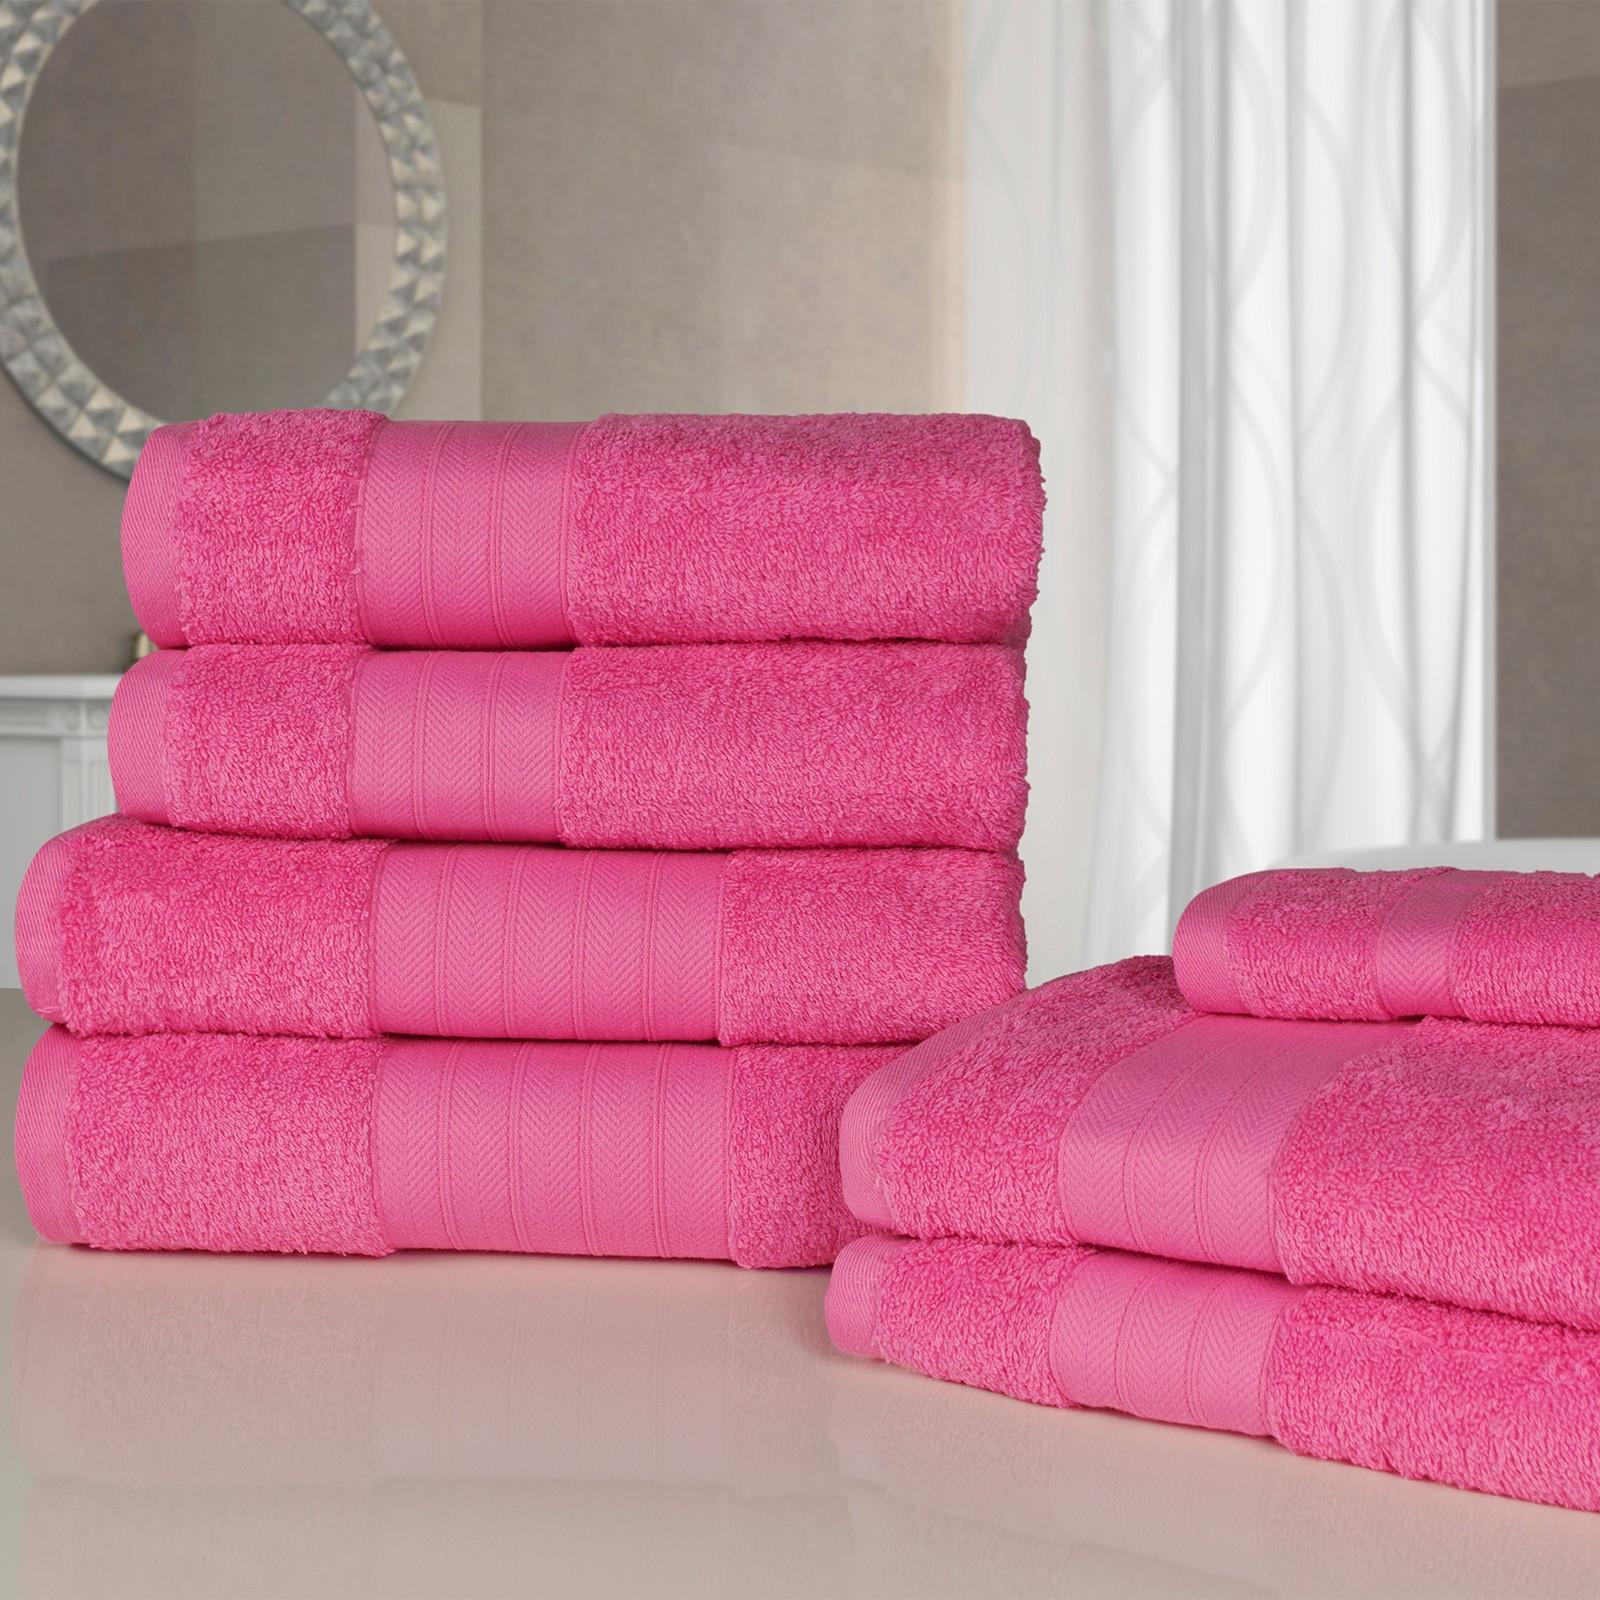 Dreamscene Towel Bale 7 Piece Fuchsia @ OnlineHomeShop £11.98 Delivered